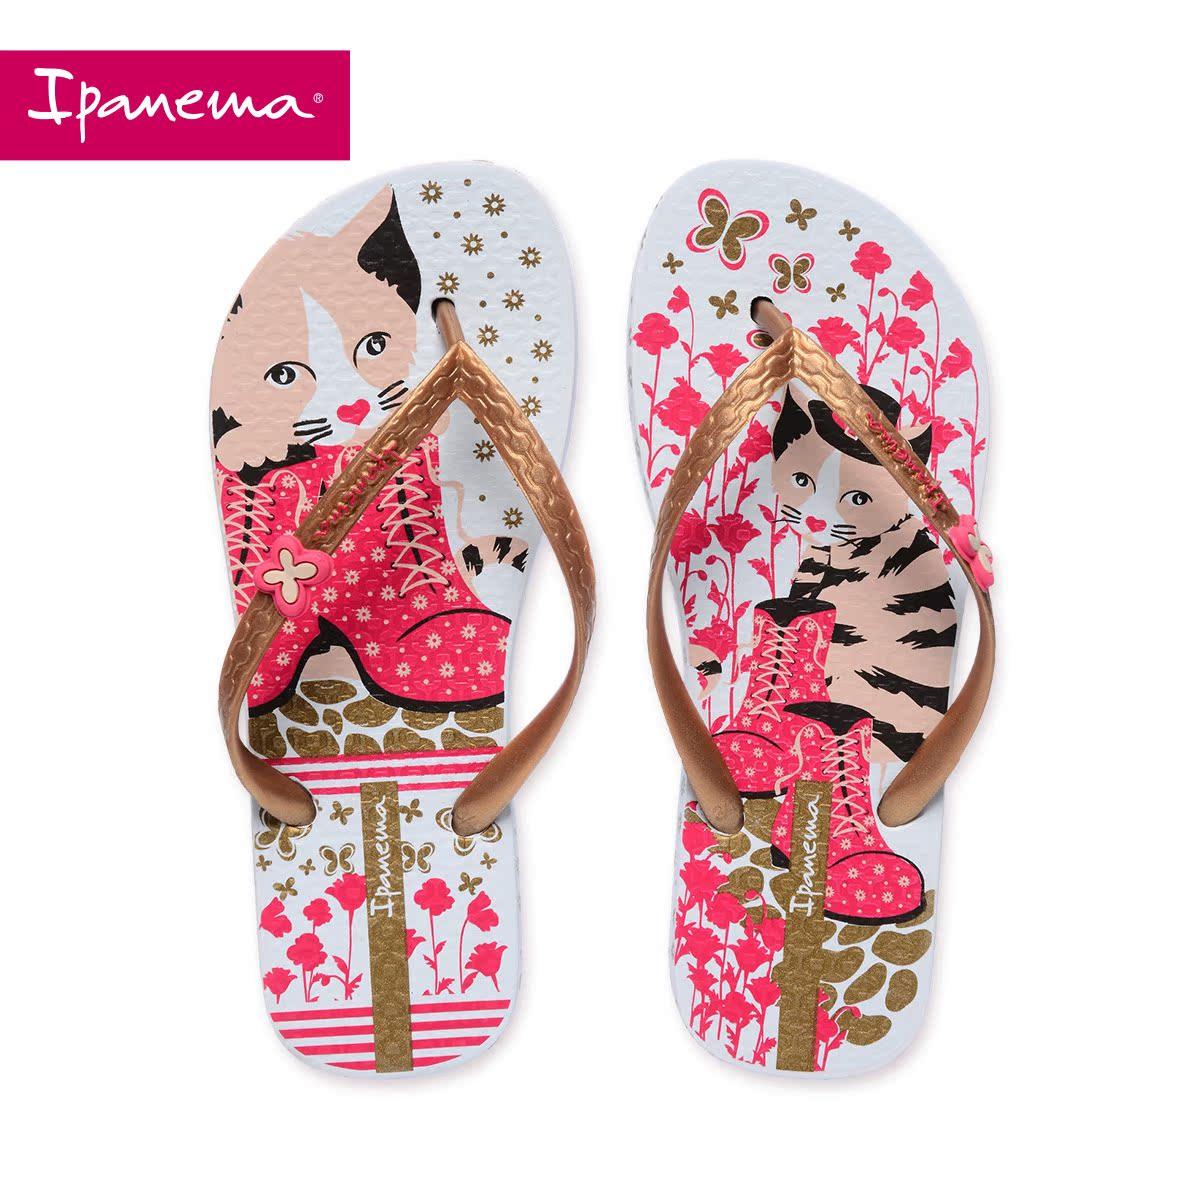 d82dcf11b Get Quotations · Ipanema ipanema summer pvc import 3d asymmetrical sandals  female beach sandals and slippers sandals and slippers